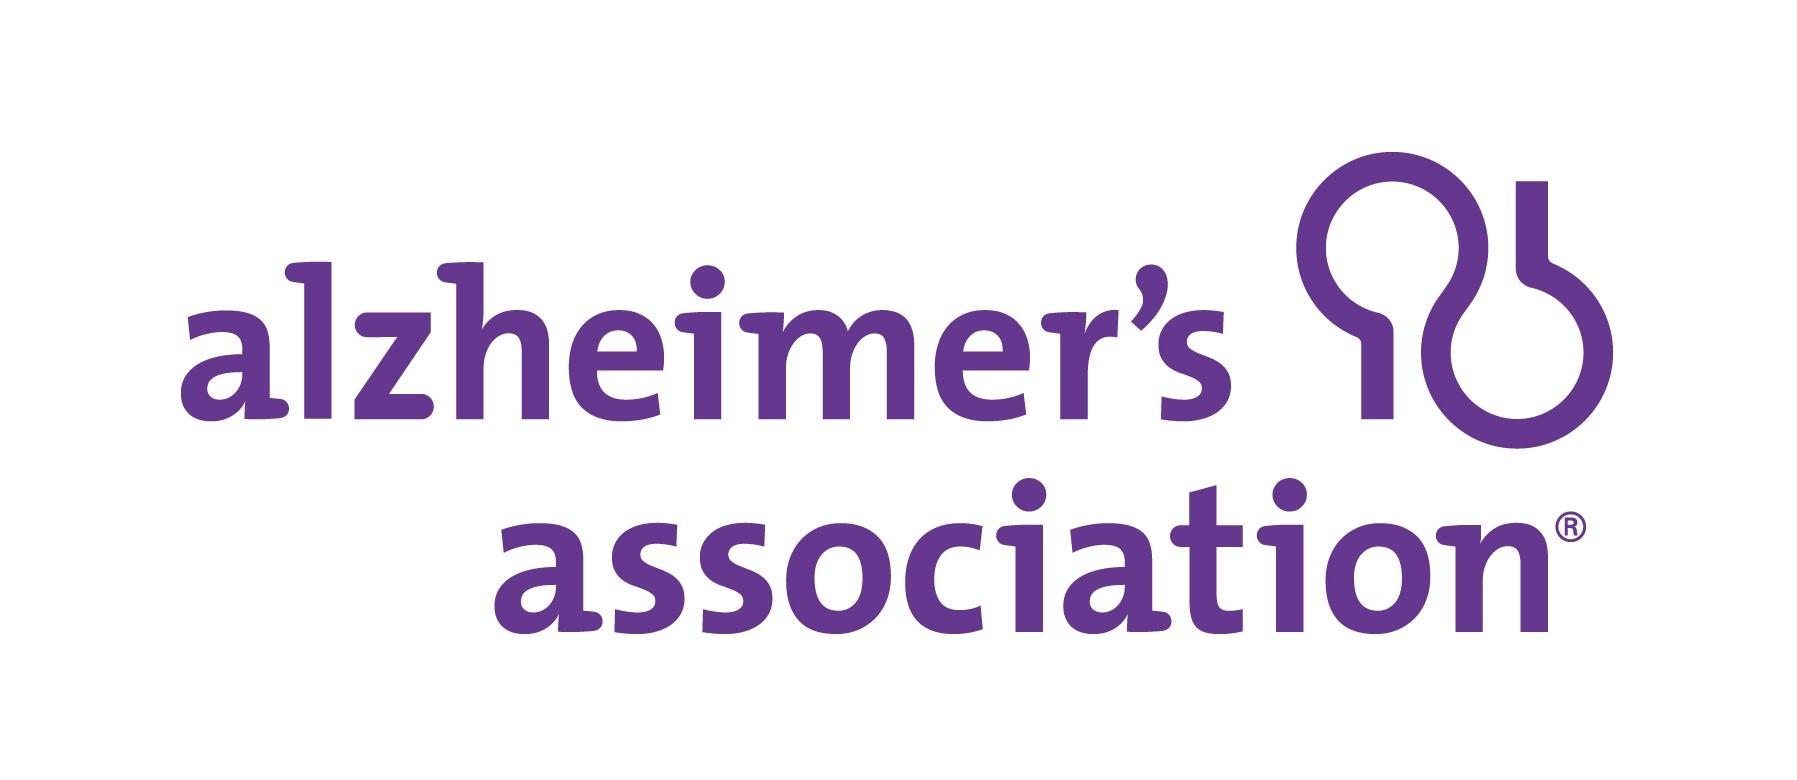 Art Center Event For Alzheimer's Patients, Families